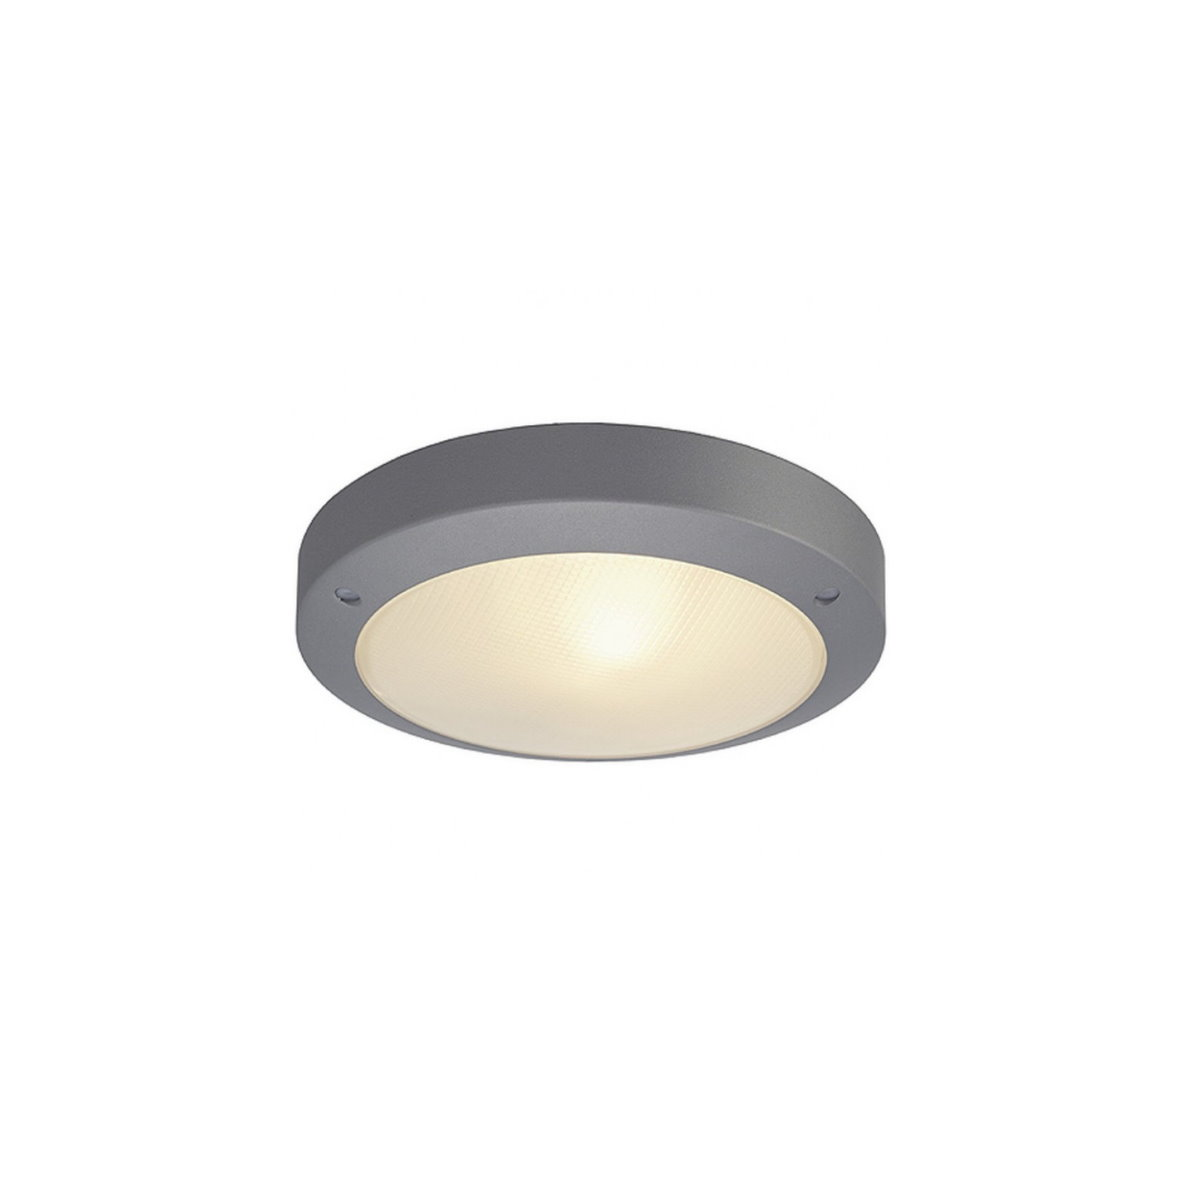 slv aussenleuchte aussen leuchte lampe wandleuchte. Black Bedroom Furniture Sets. Home Design Ideas